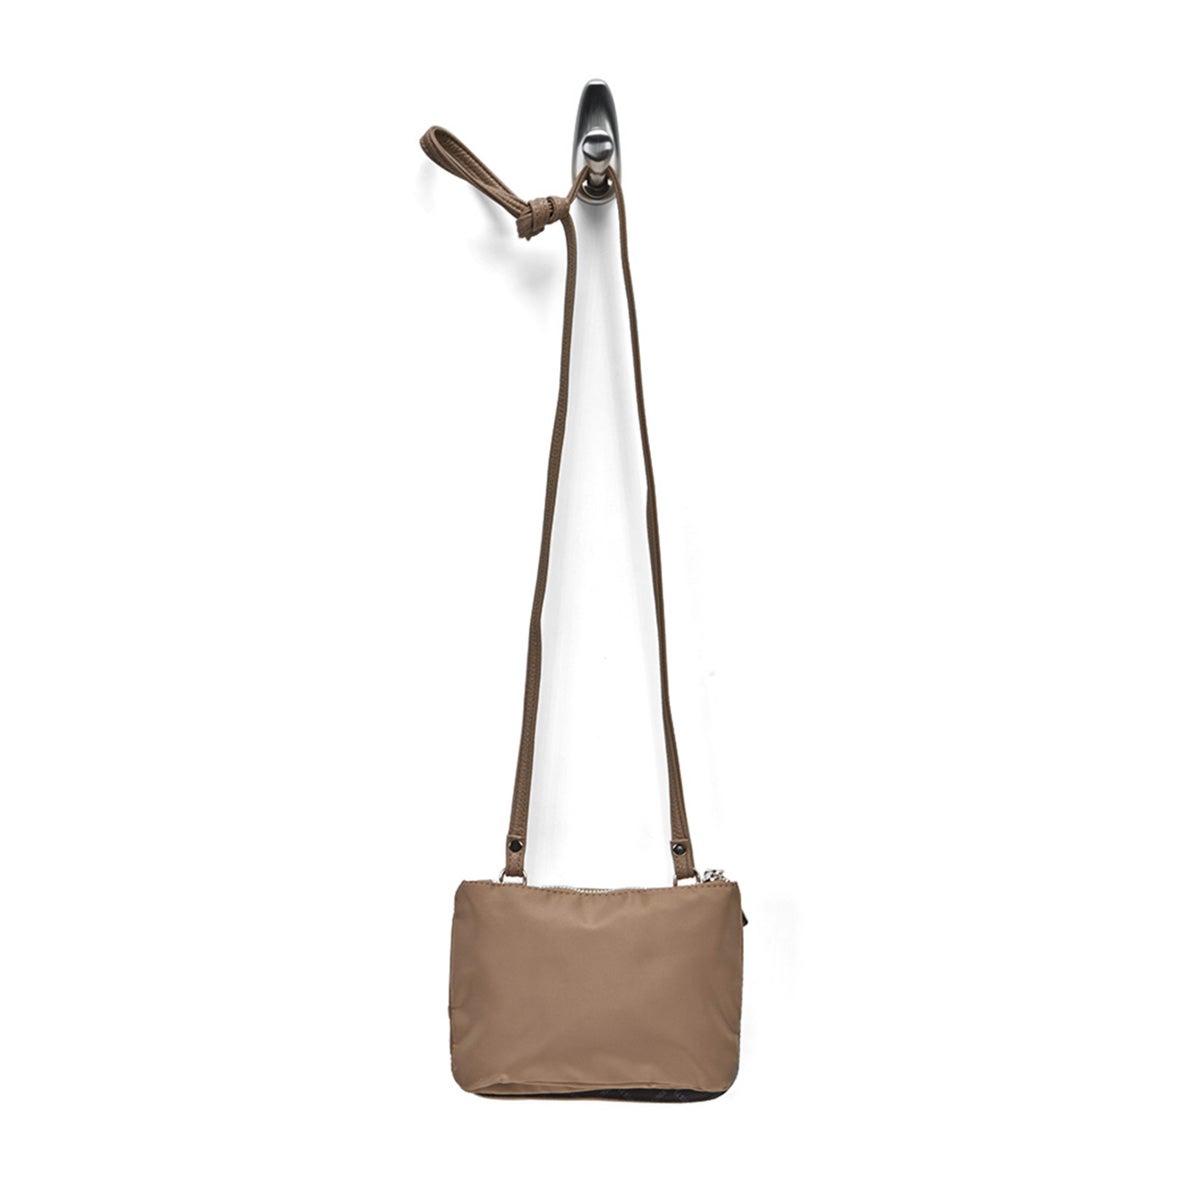 Lds Roots73 tpe mini crossbody bag